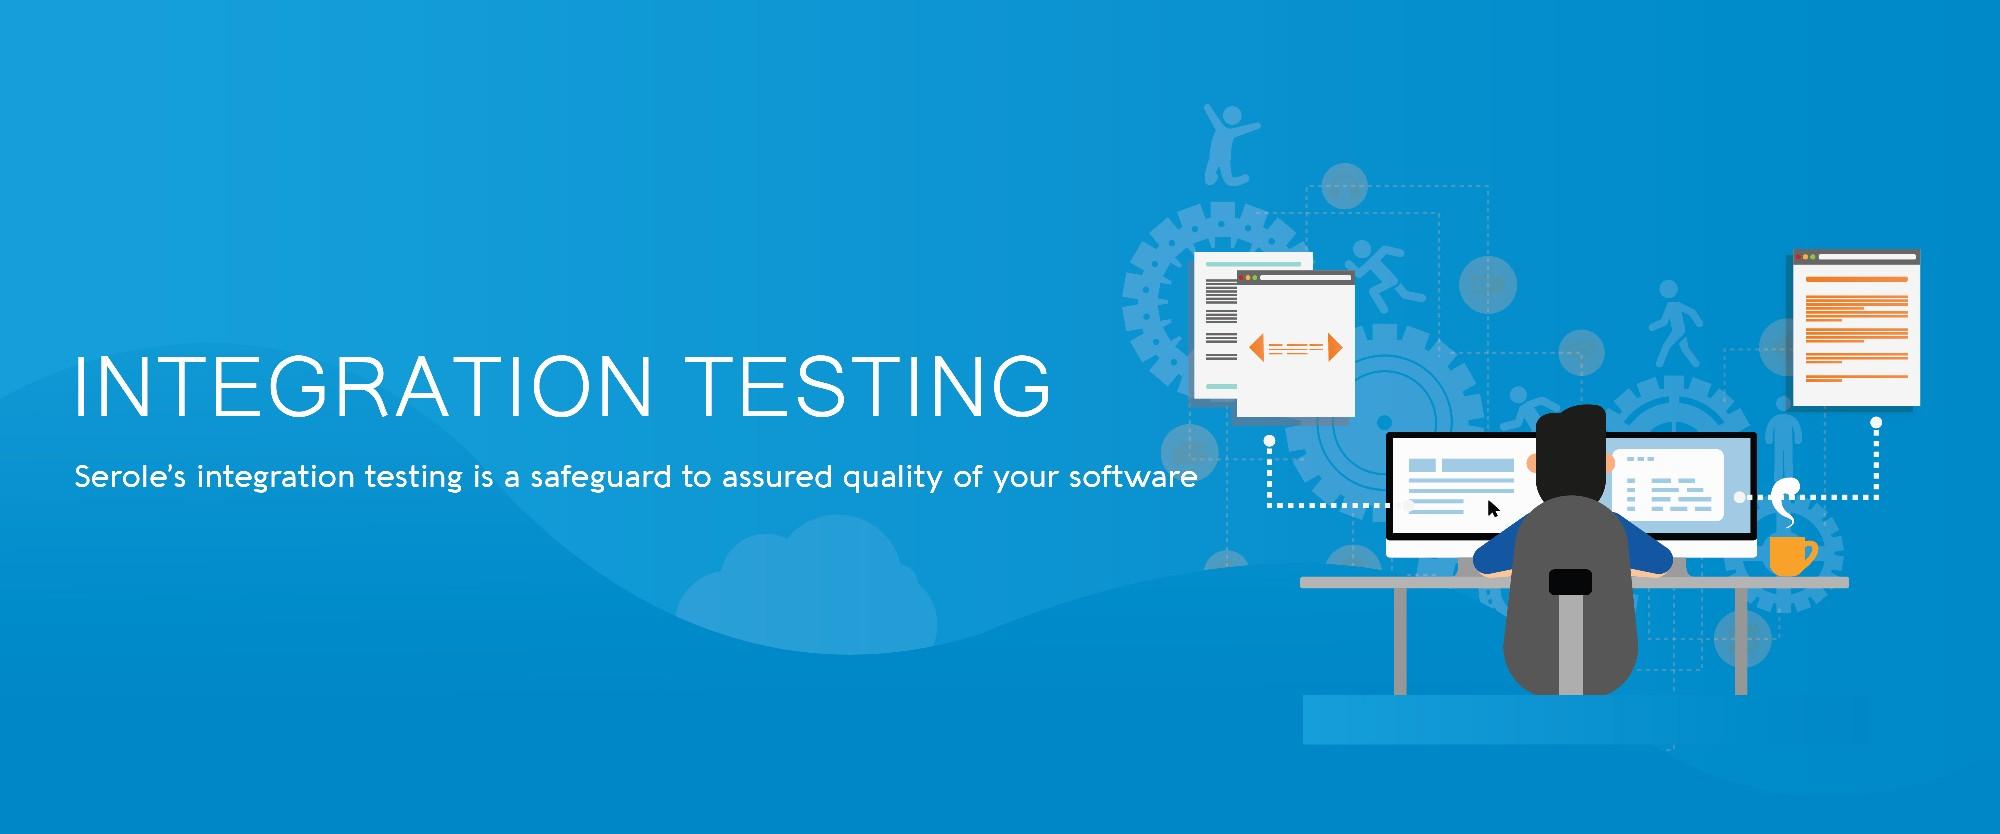 2.Integration Testing-01